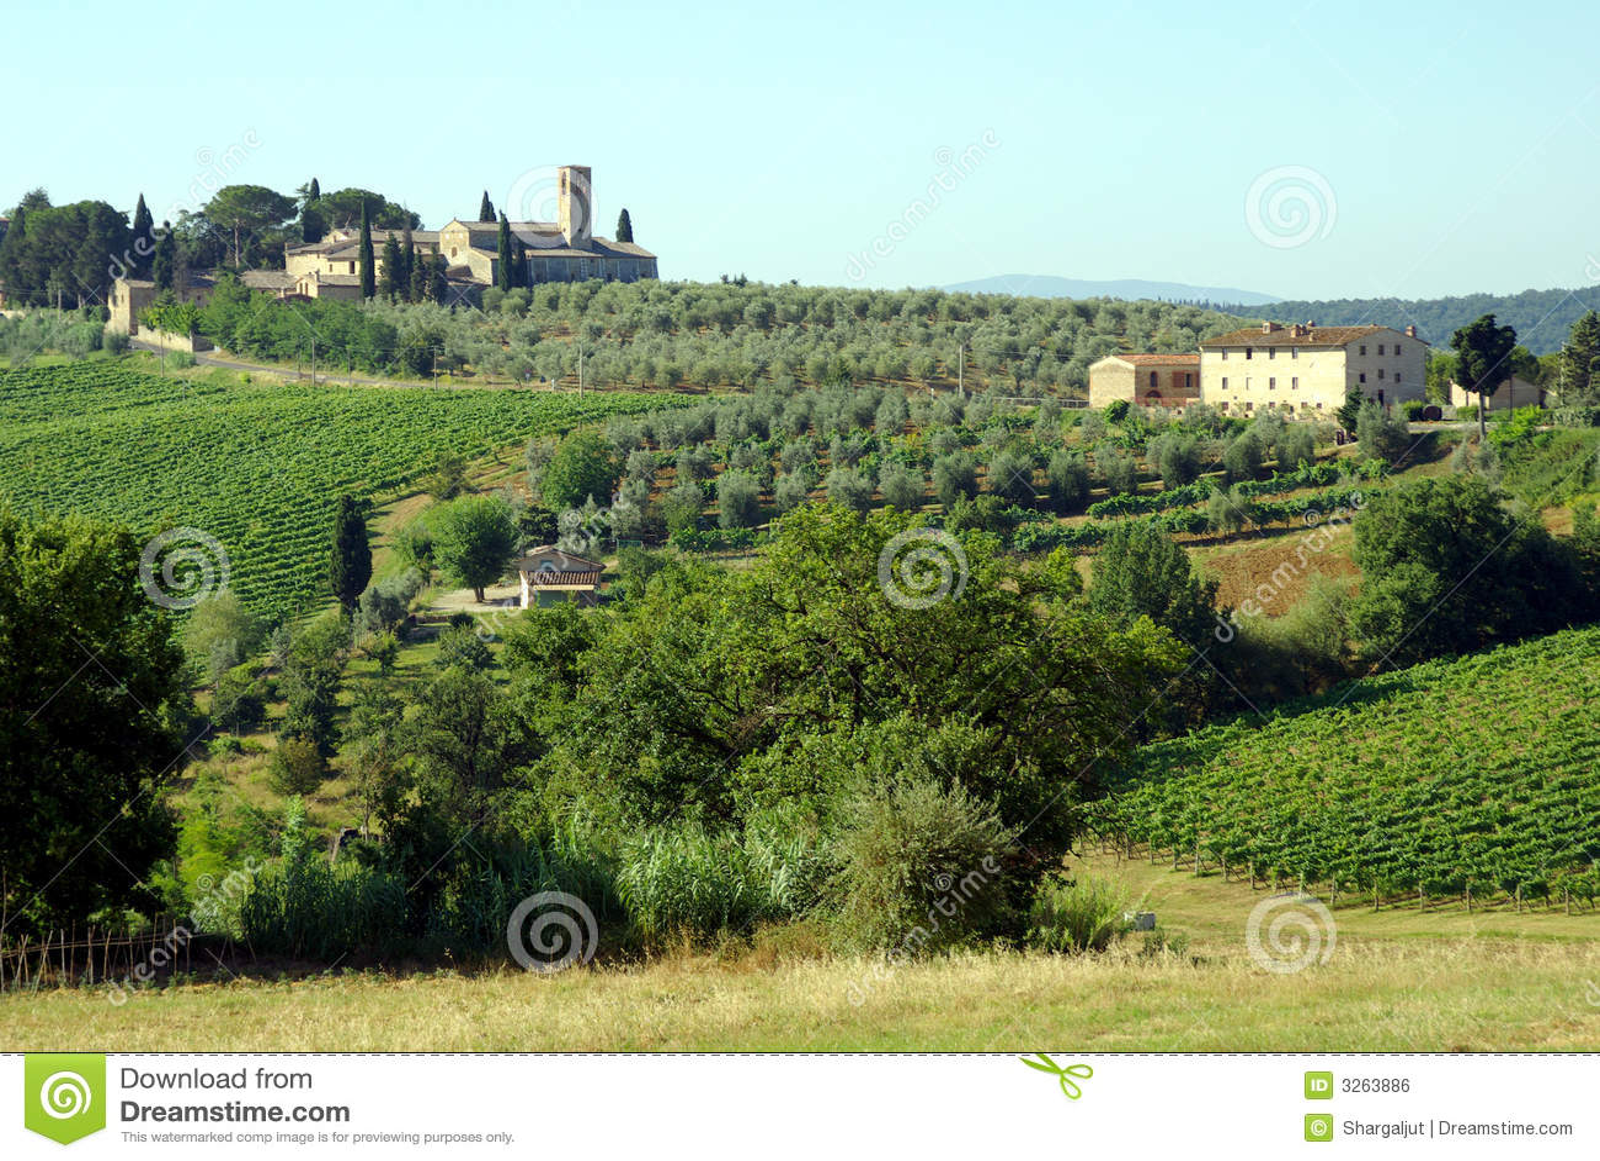 Fermes en Toscane, Italie